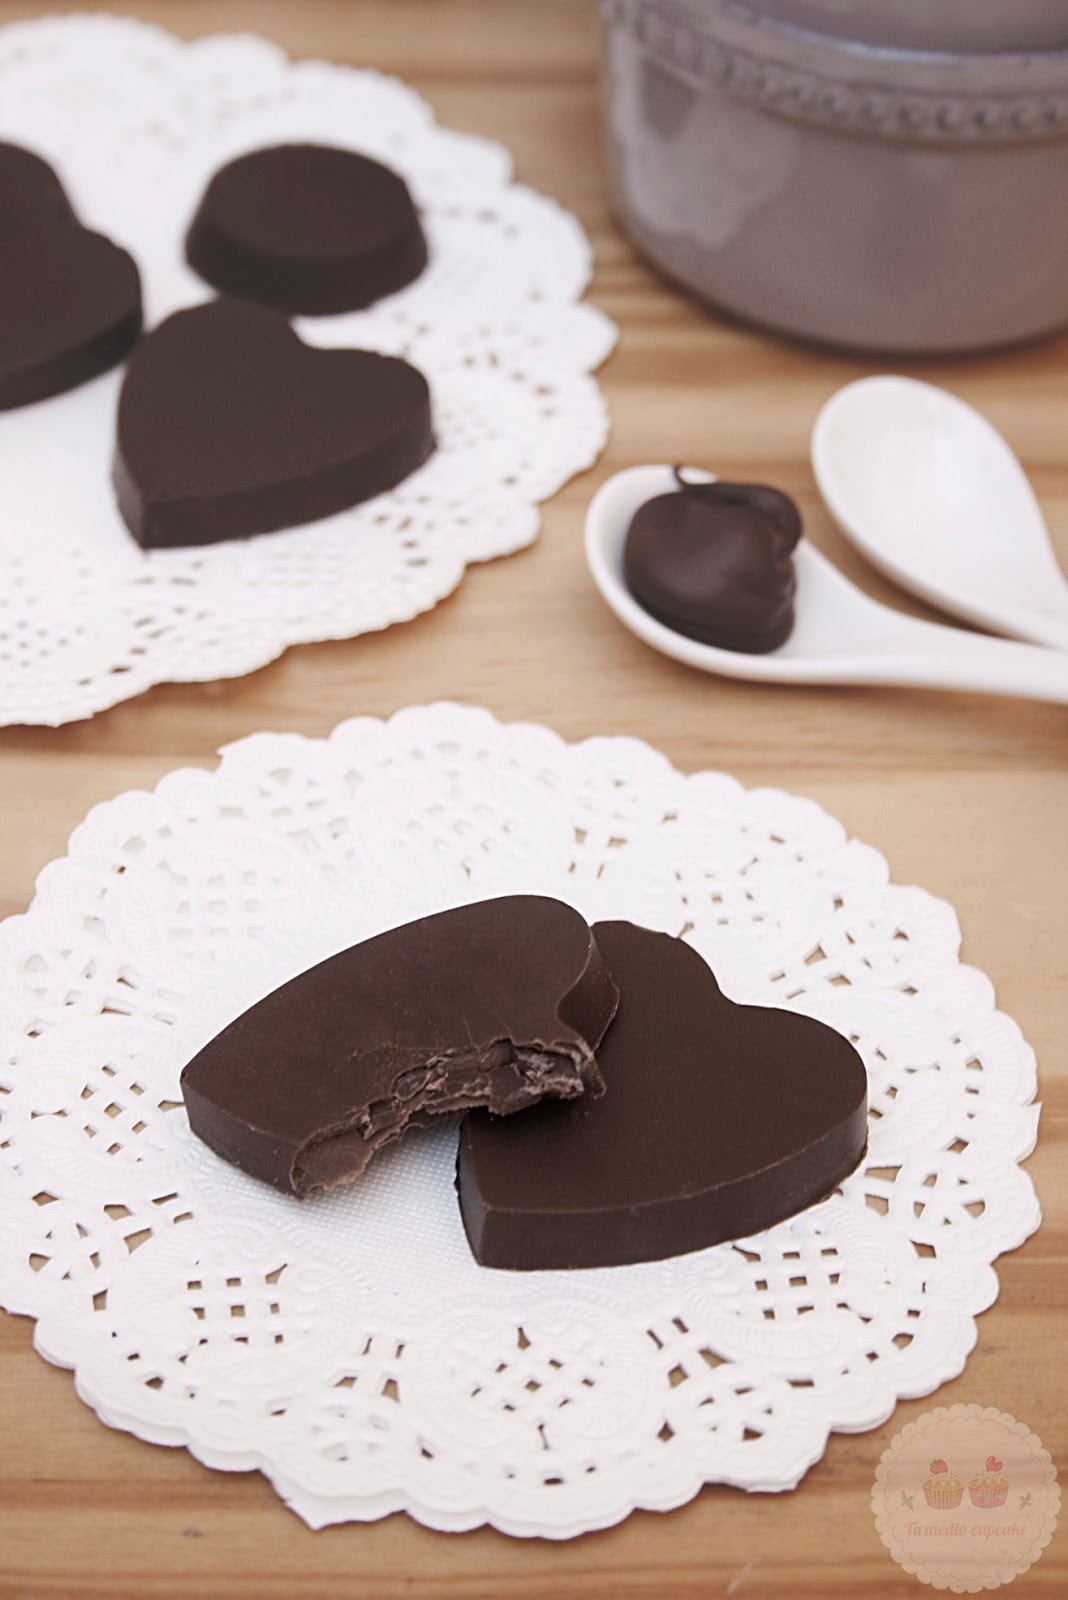 http://tumediocupcake.blogspot.com.es/2014/02/bombones-de-nutella-relleno-blando.html